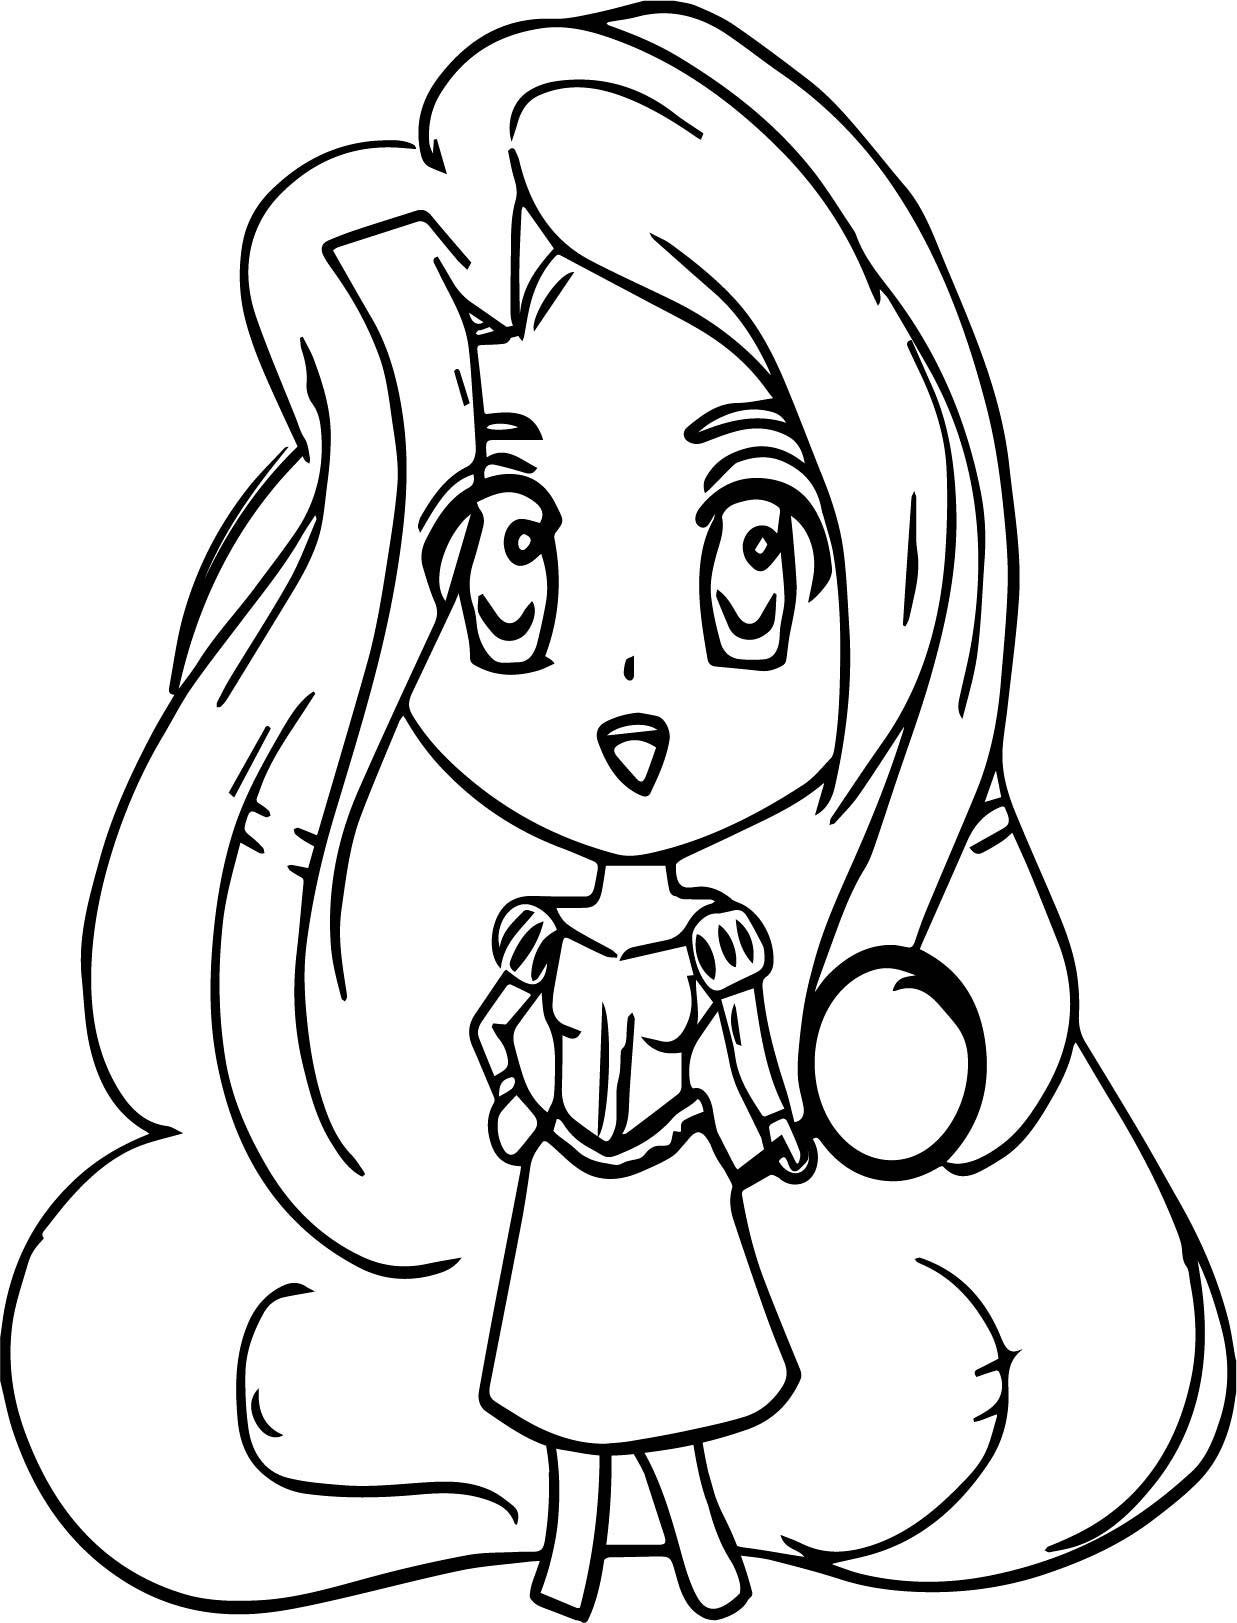 chibi manga rapunzel coloring page wecoloringpage